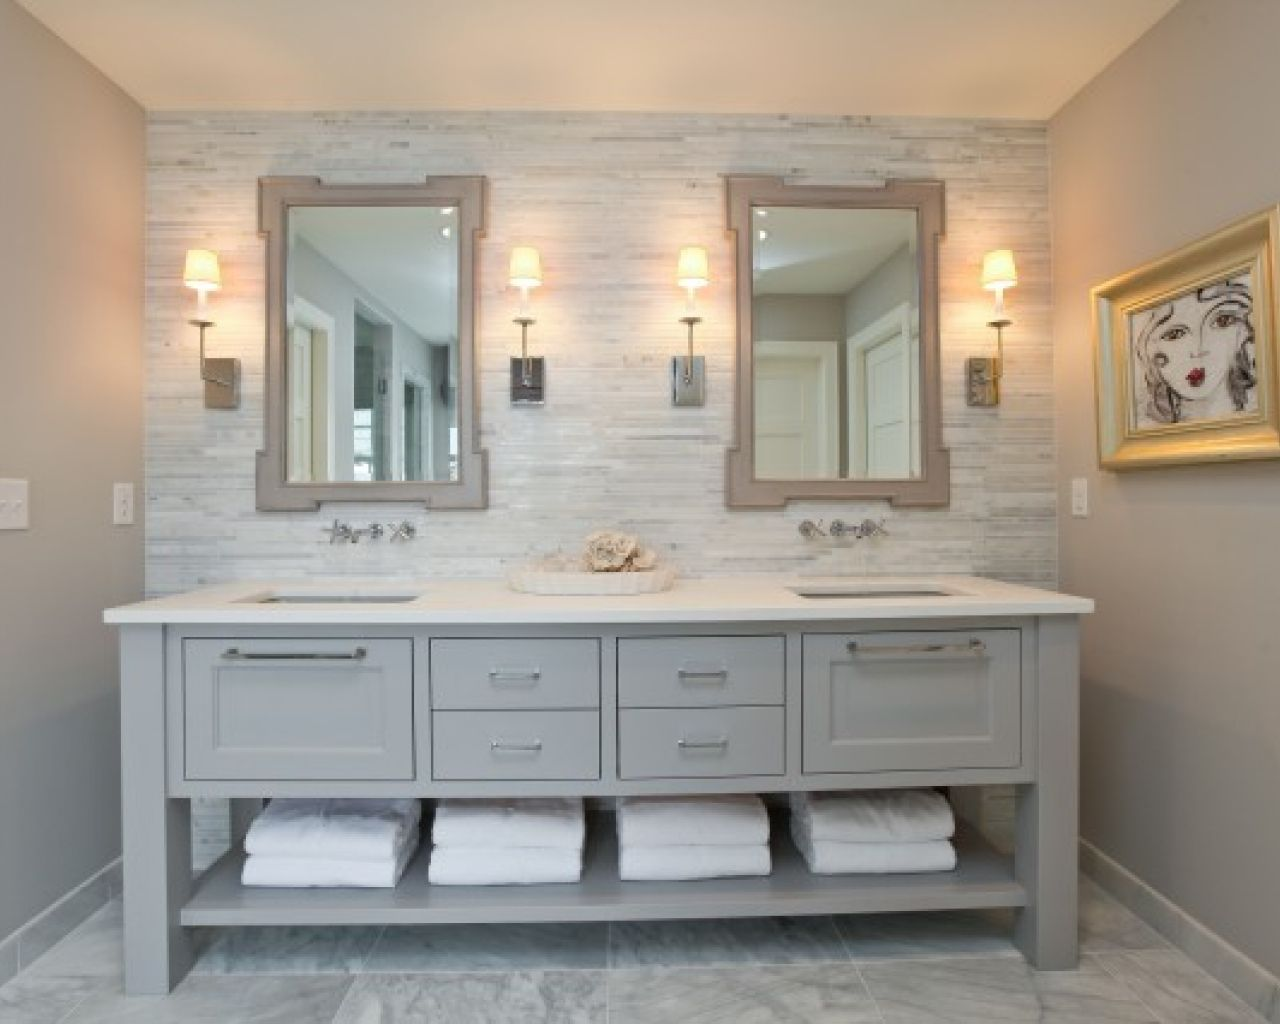 Bathroom, Great Bathroom Vanity White Quartz Countertop Marble